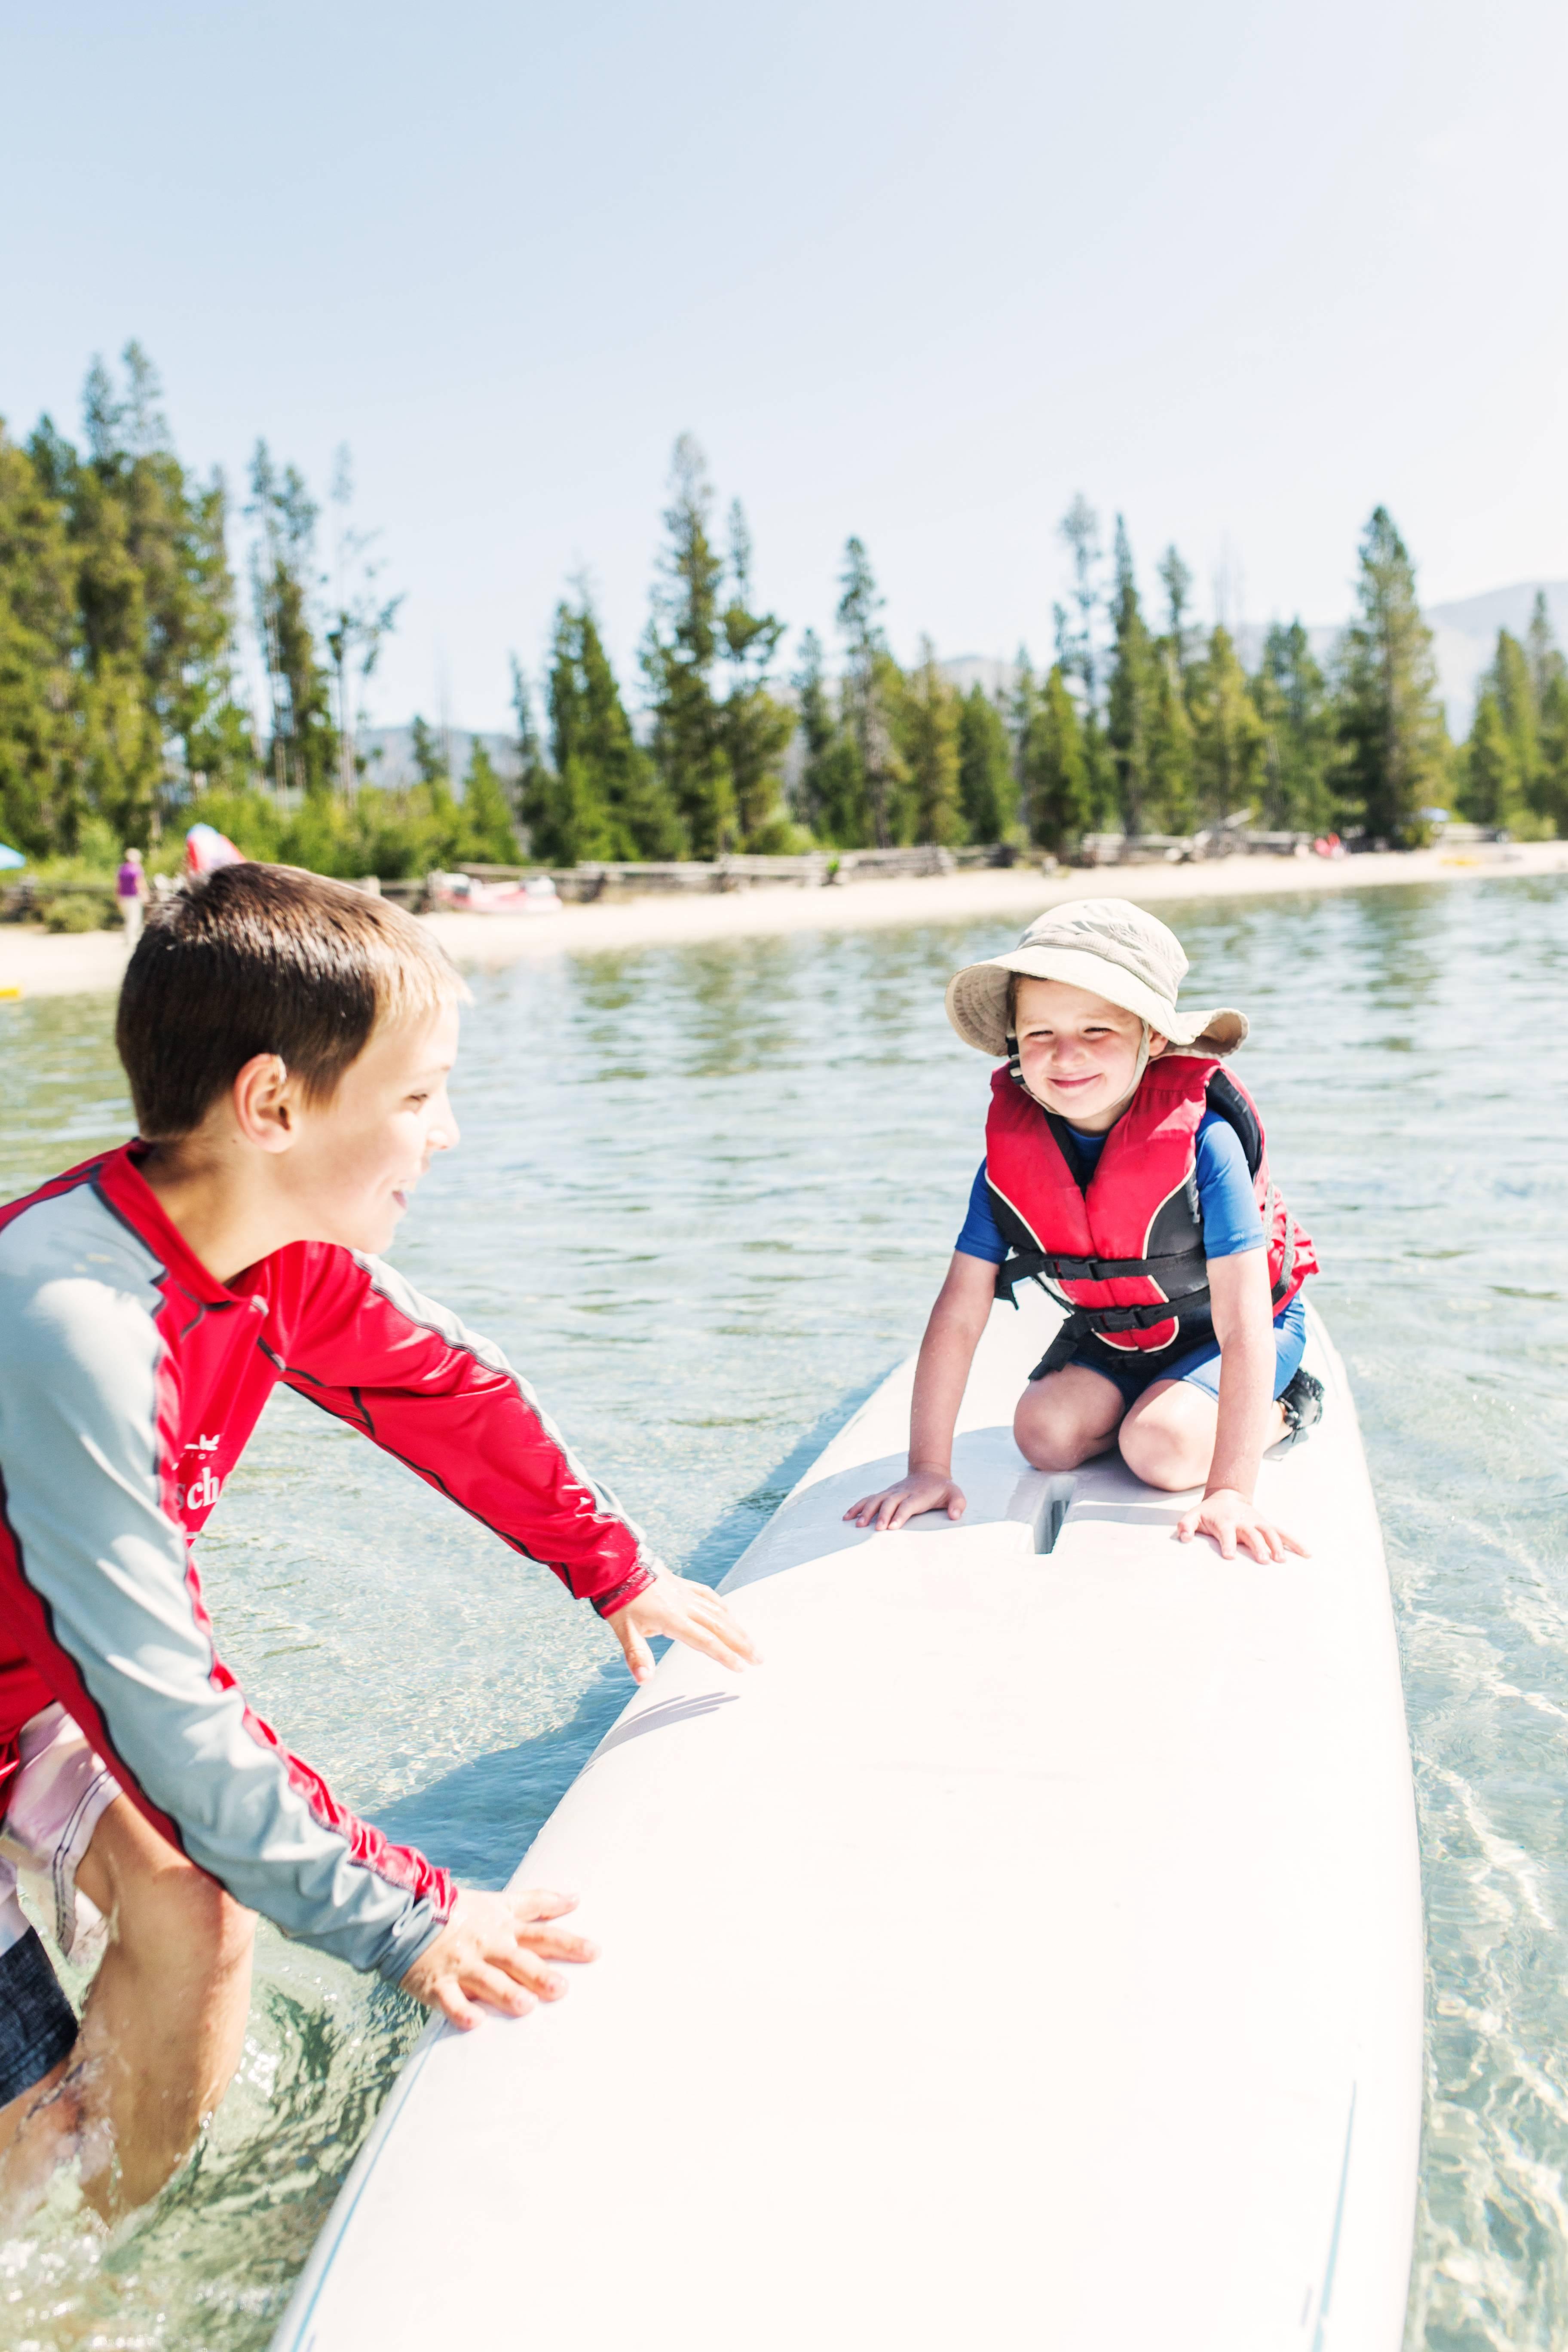 Stand up paddle boarding at Redfish Lake. Photo Credit: Idaho Tourism.